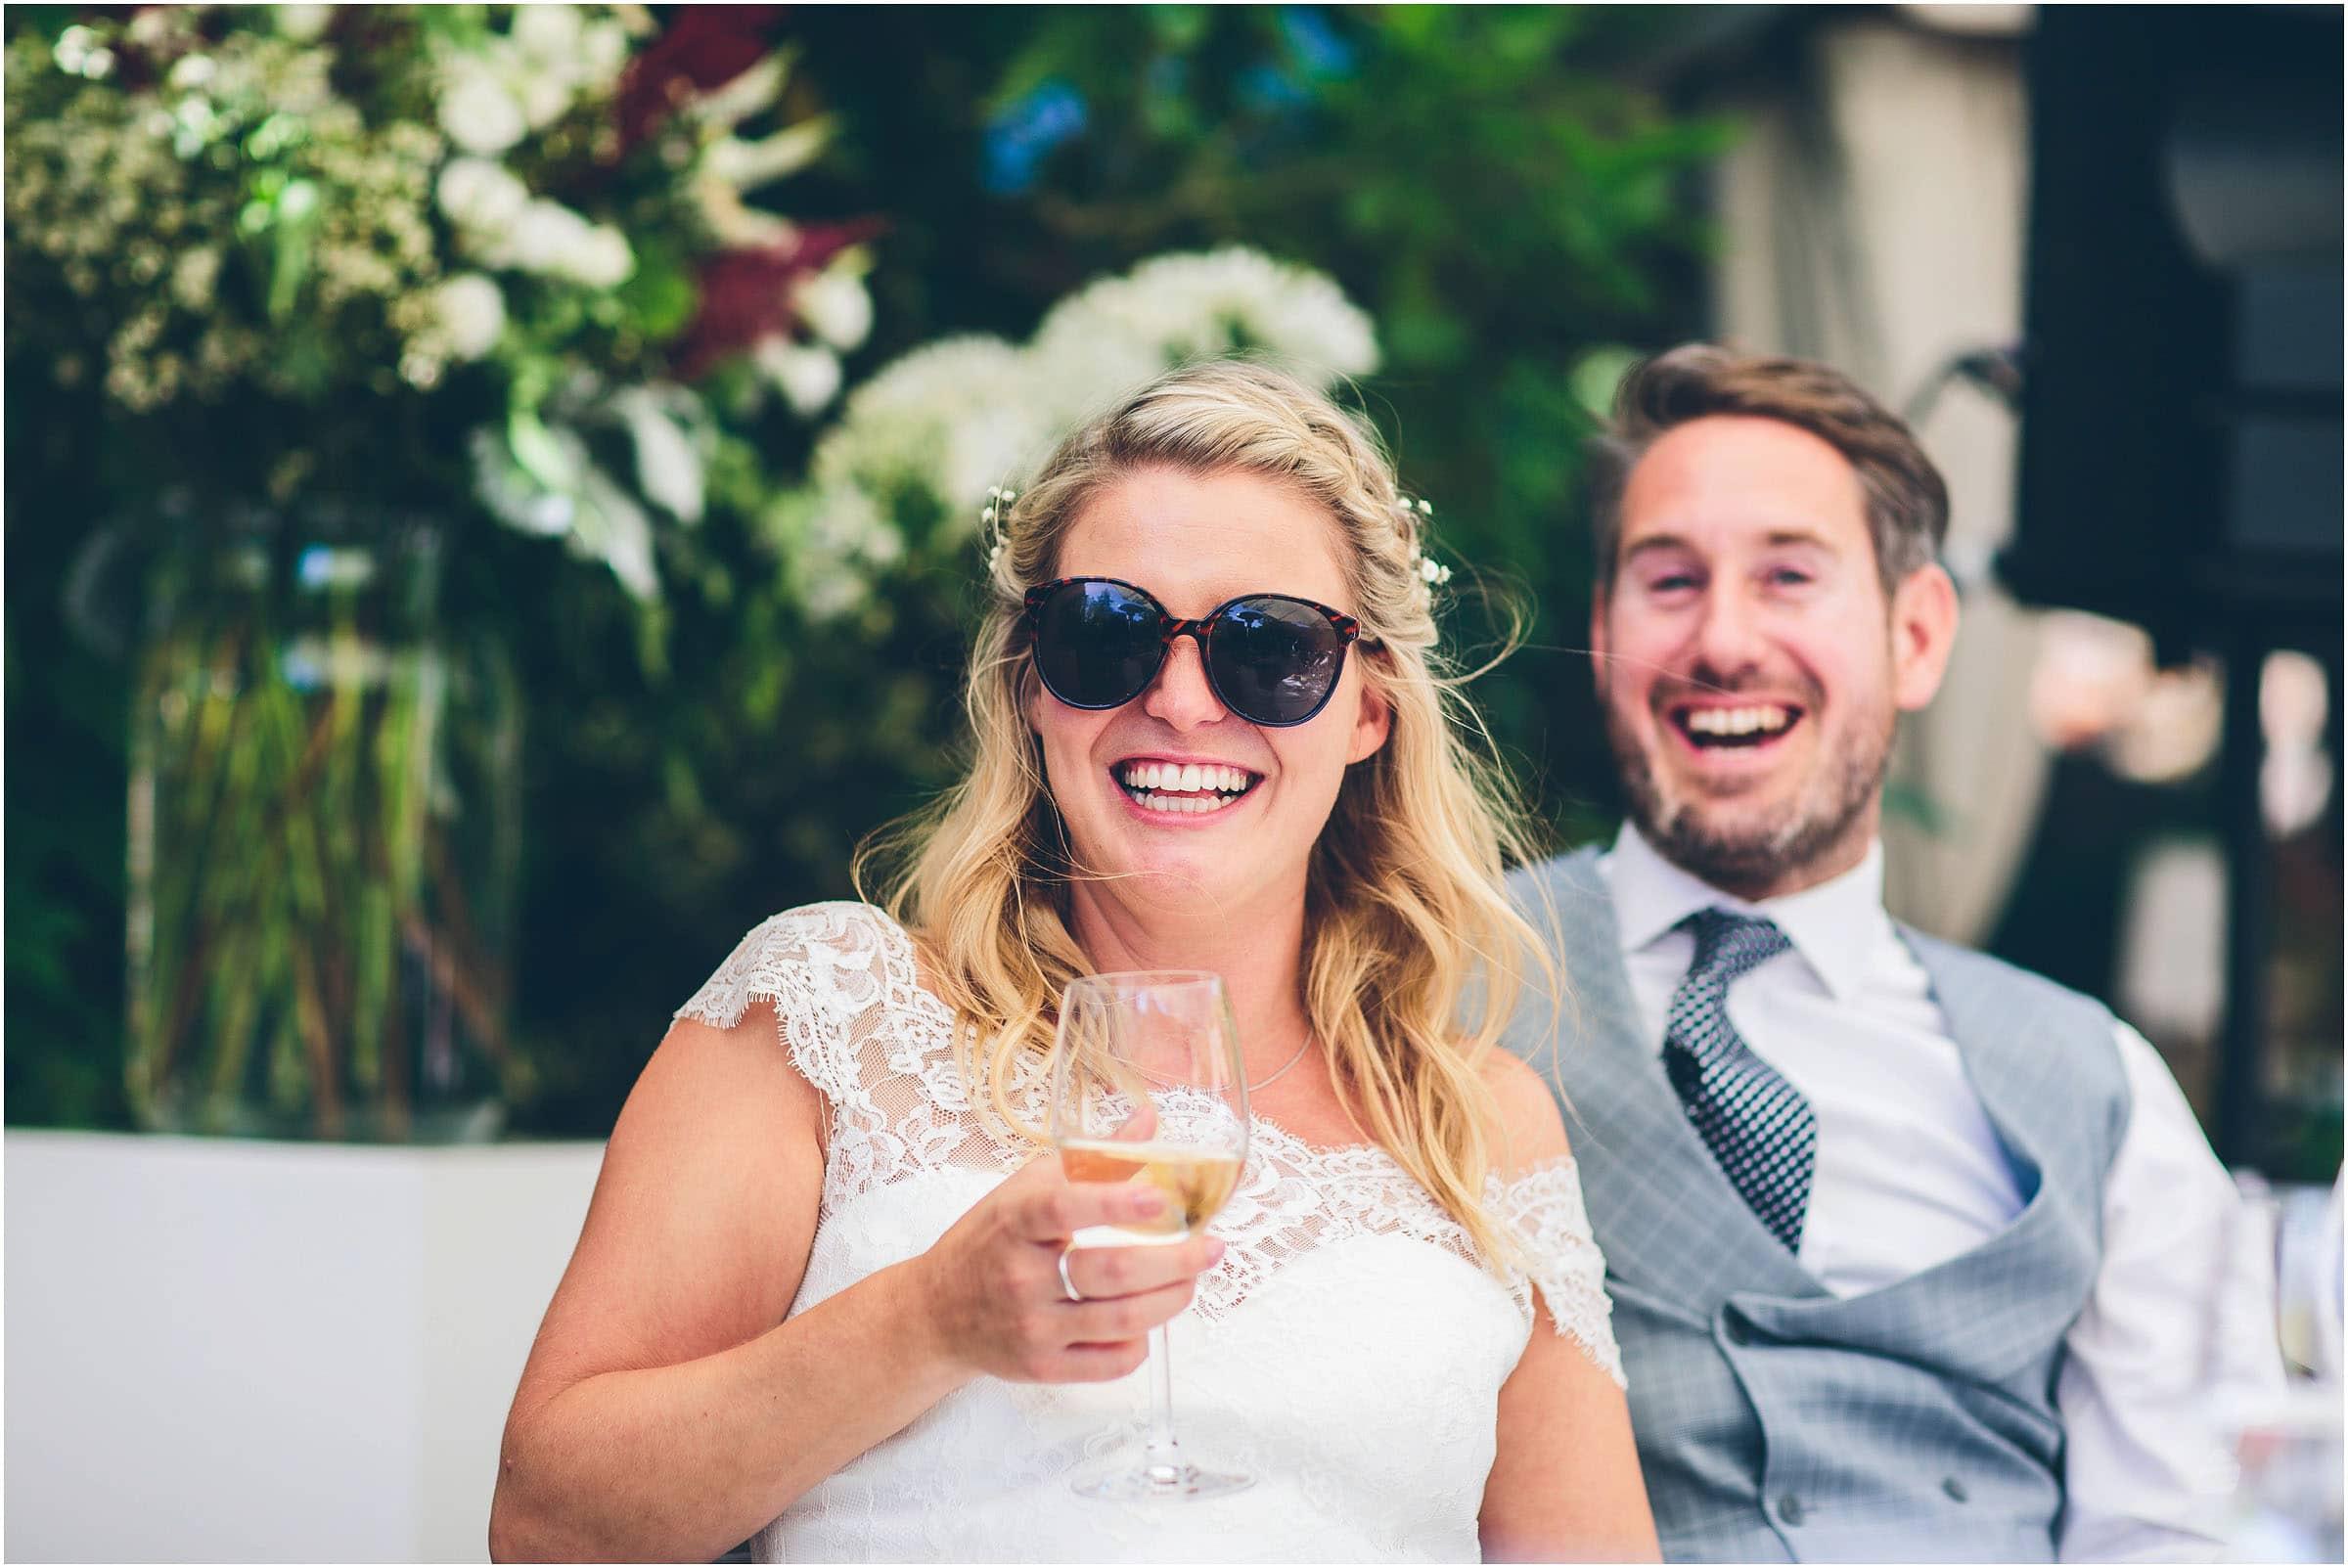 Kensington_Roof_Gardens_Wedding_Photography_0090